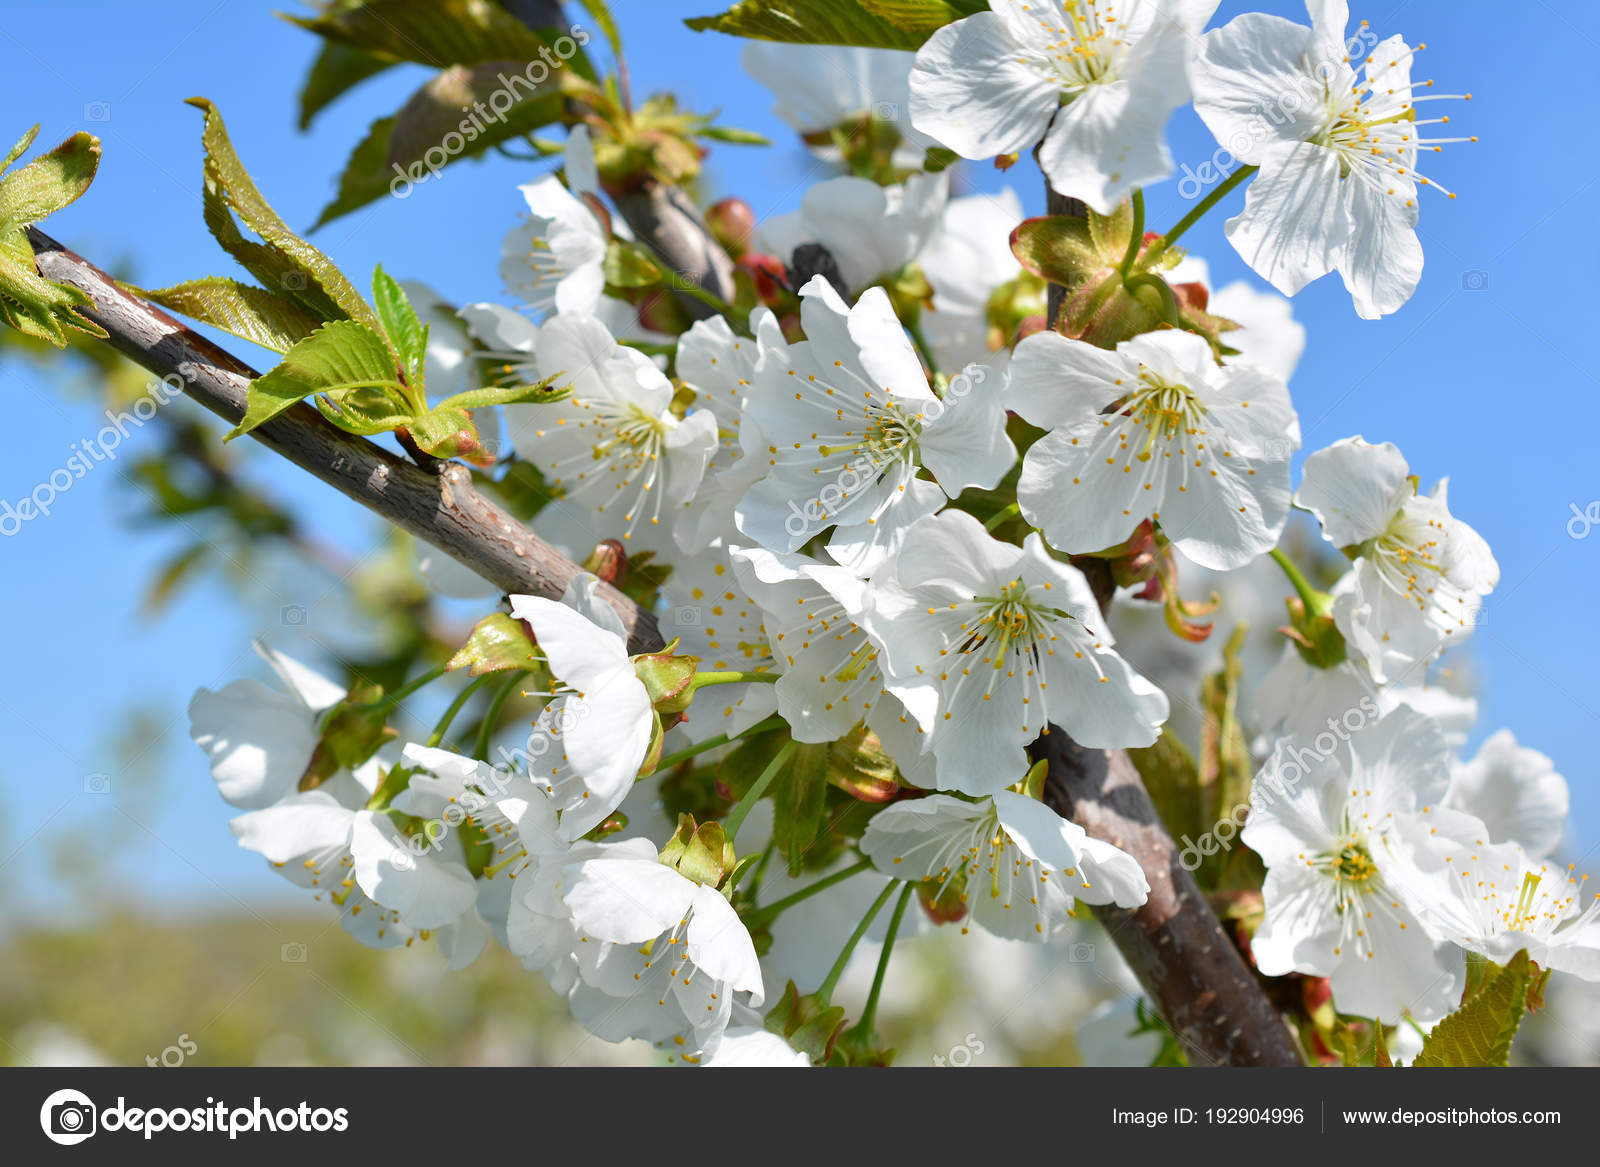 Sweet White Flowers Blooming Cherry Tree Cherries In The Spring